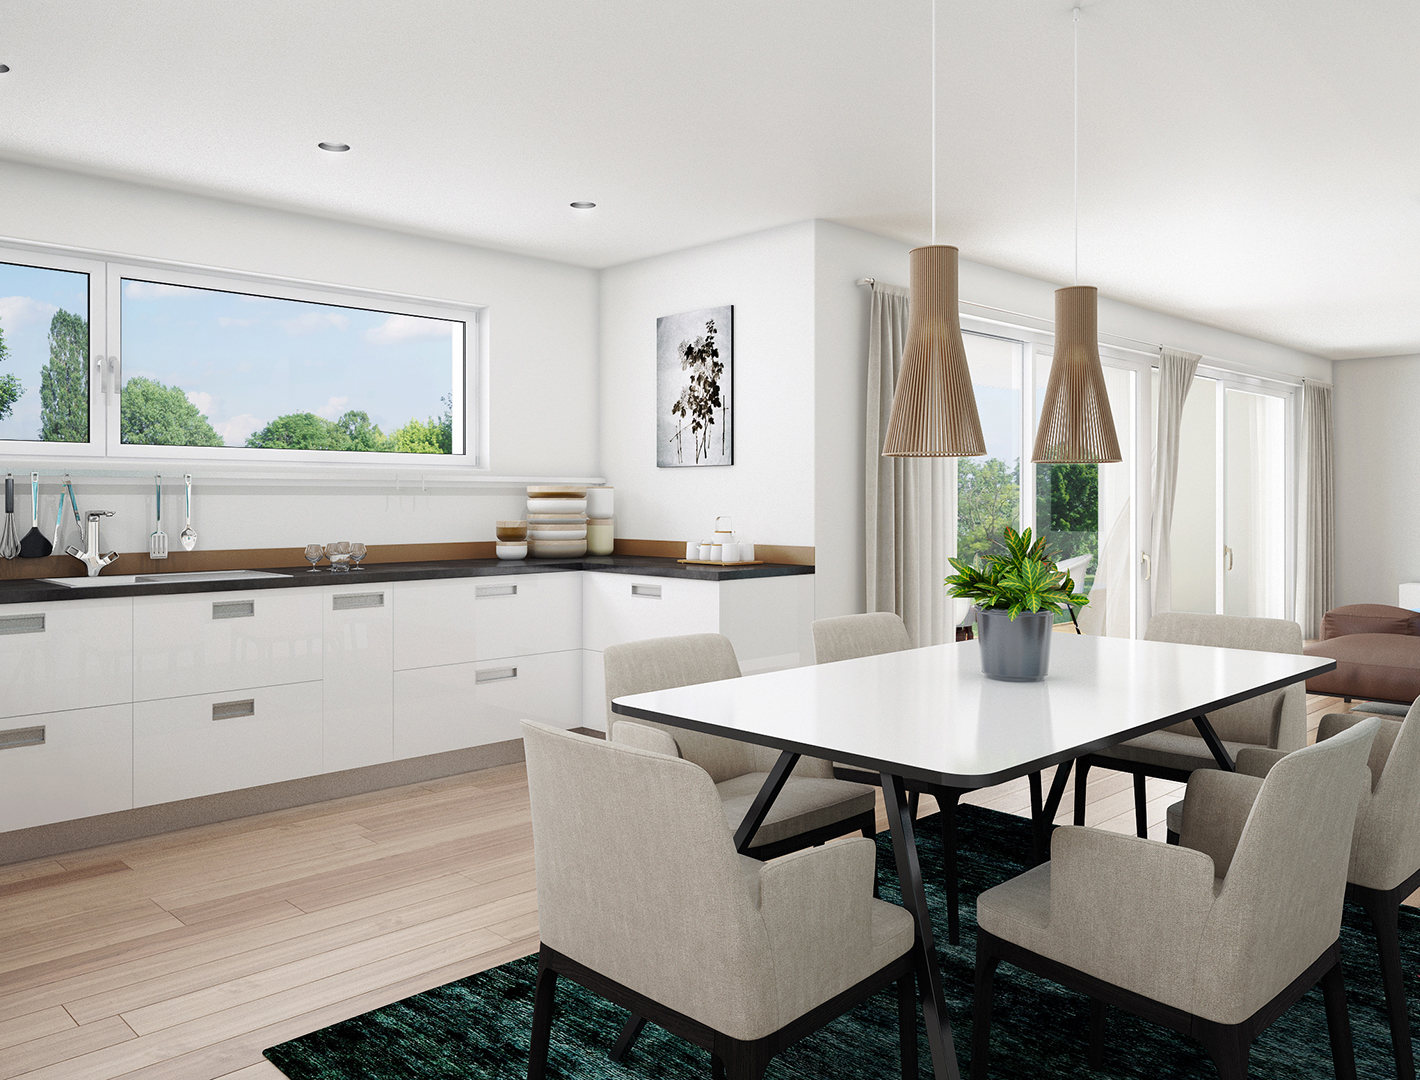 Real estate - Vouvry - Villas